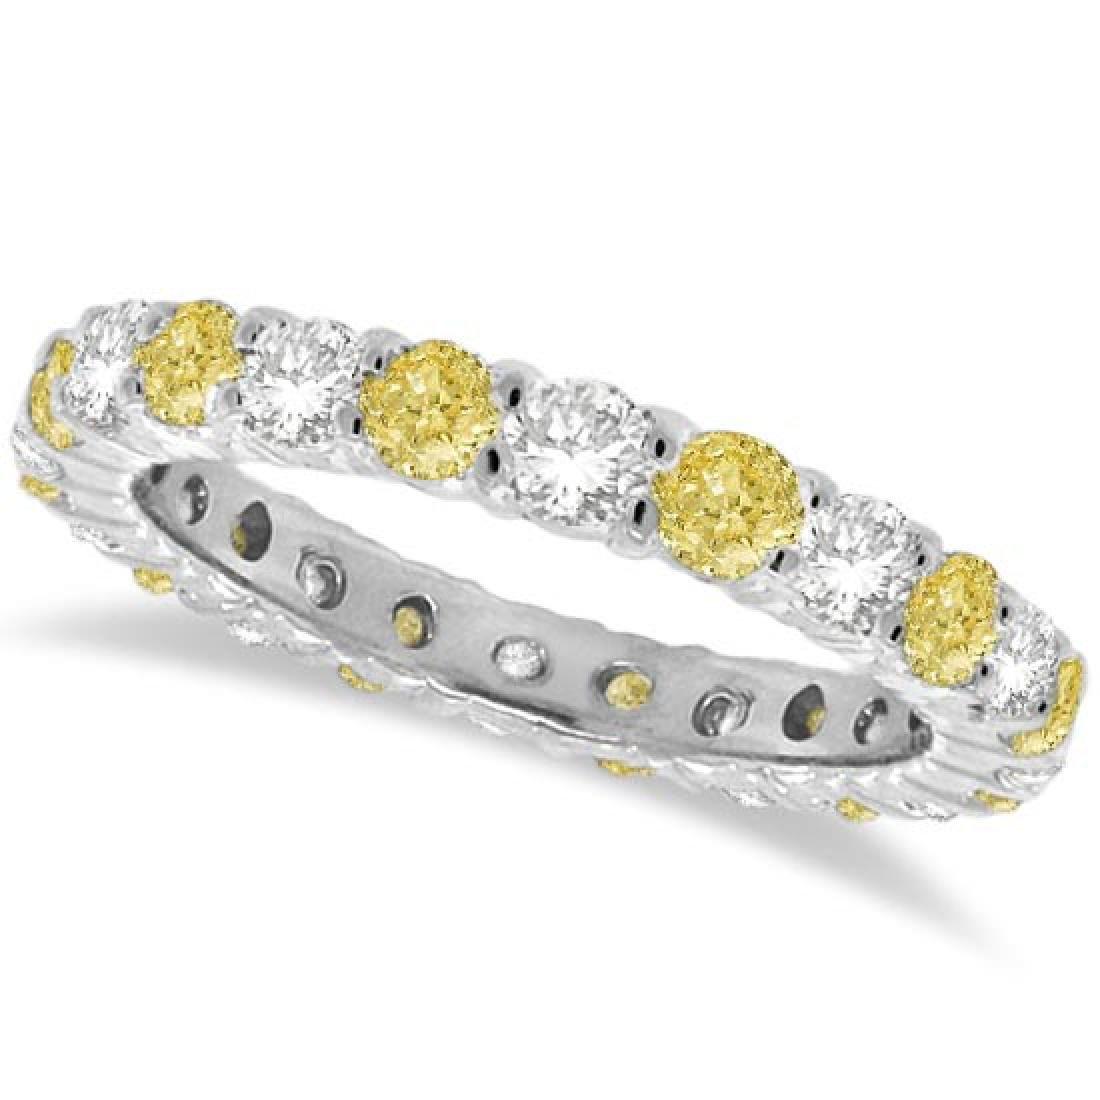 Fancy Yellow Canary and White Diamond Eternity Band 14k